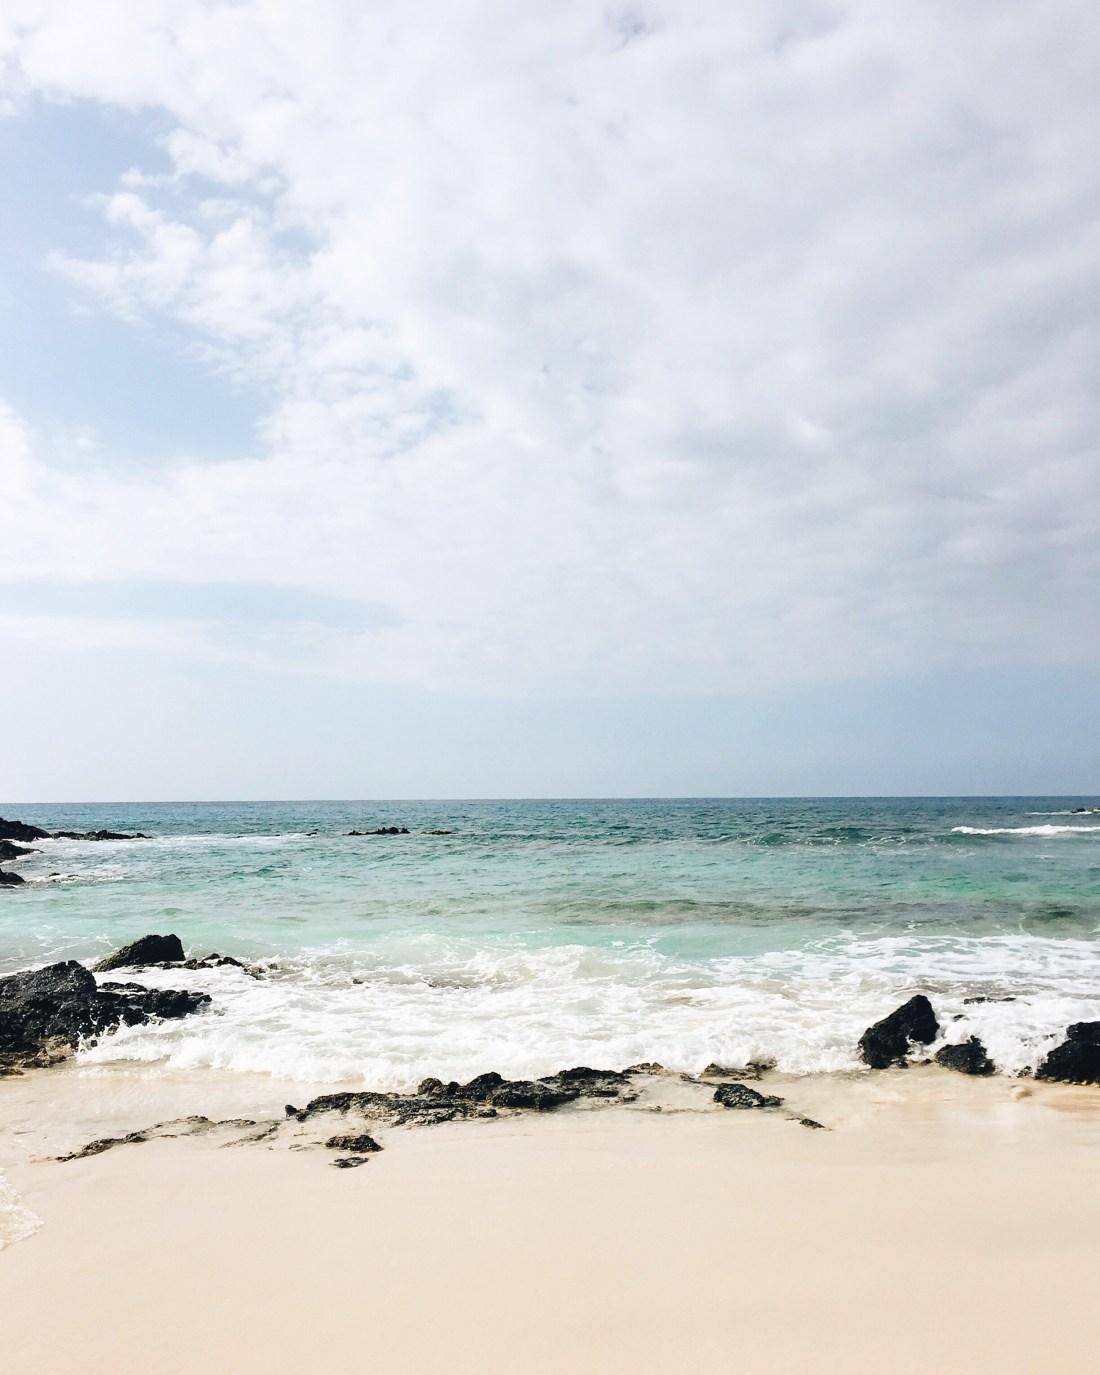 Best Things To Do In Hawaii | Ultimate Big Island Travel Guide | Hawaii Travel Guide | Kona Hawaii | Hilo Hawaii | Traveling to Hawaii | Things To Do In Hawaii | Vacationing to the Big Island of Hawaii | What To Do On The Big Island of Hawaii | via @elanaloo + elanaloo.com